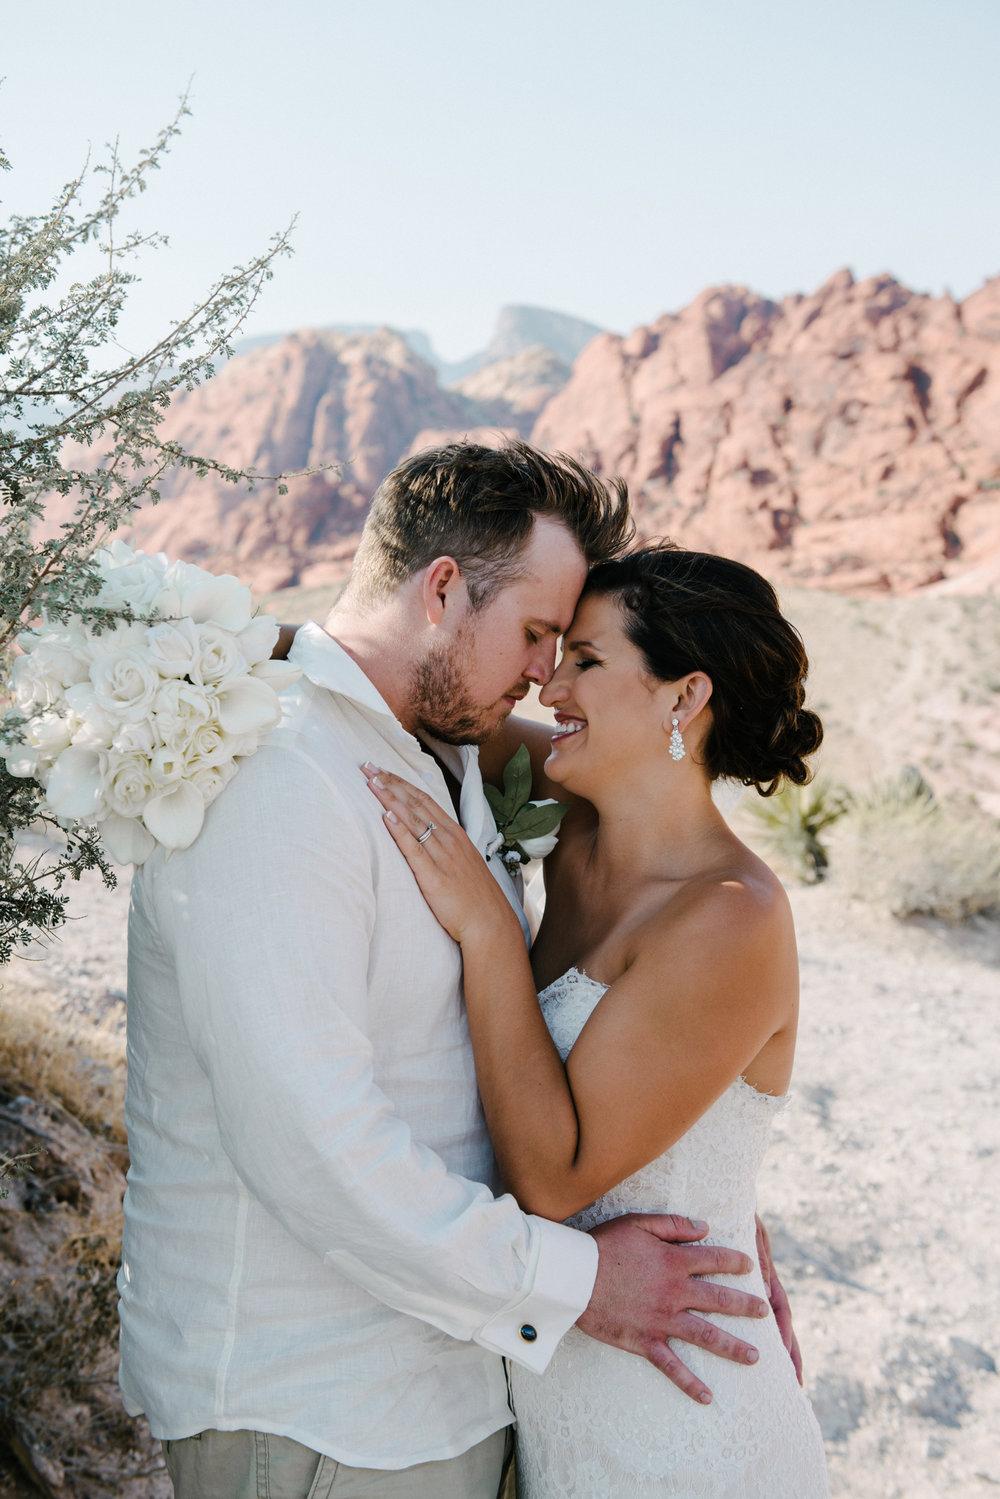 031_Redrock_canyon_vegas_wedding_photographer.jpg